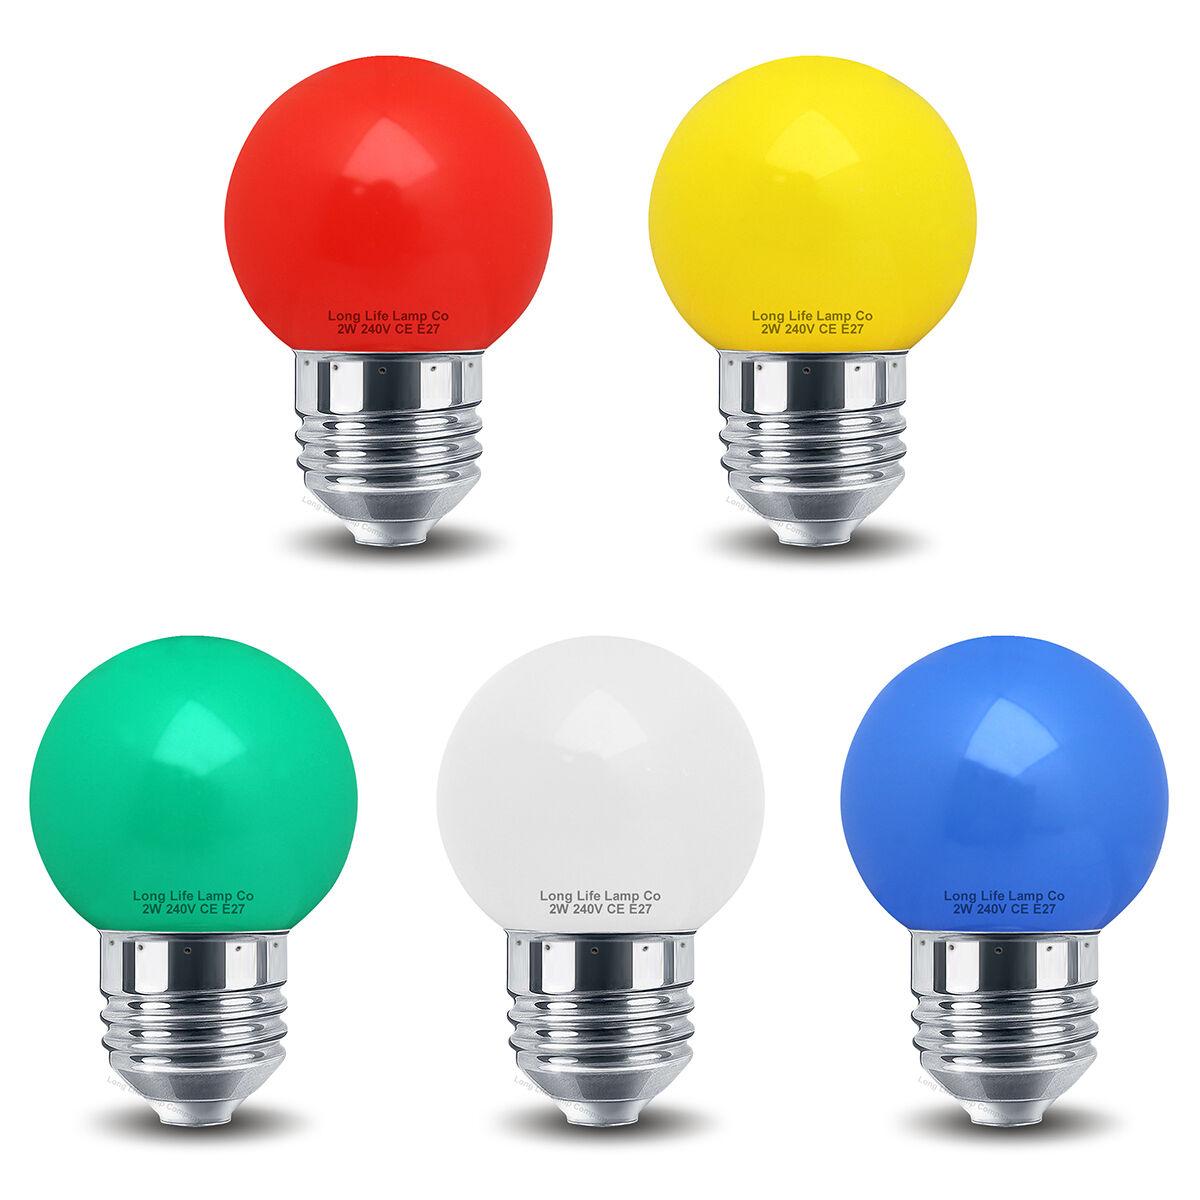 2w led mini golf ball light bulb e27 colour golfball red blue green yellow white ebay. Black Bedroom Furniture Sets. Home Design Ideas